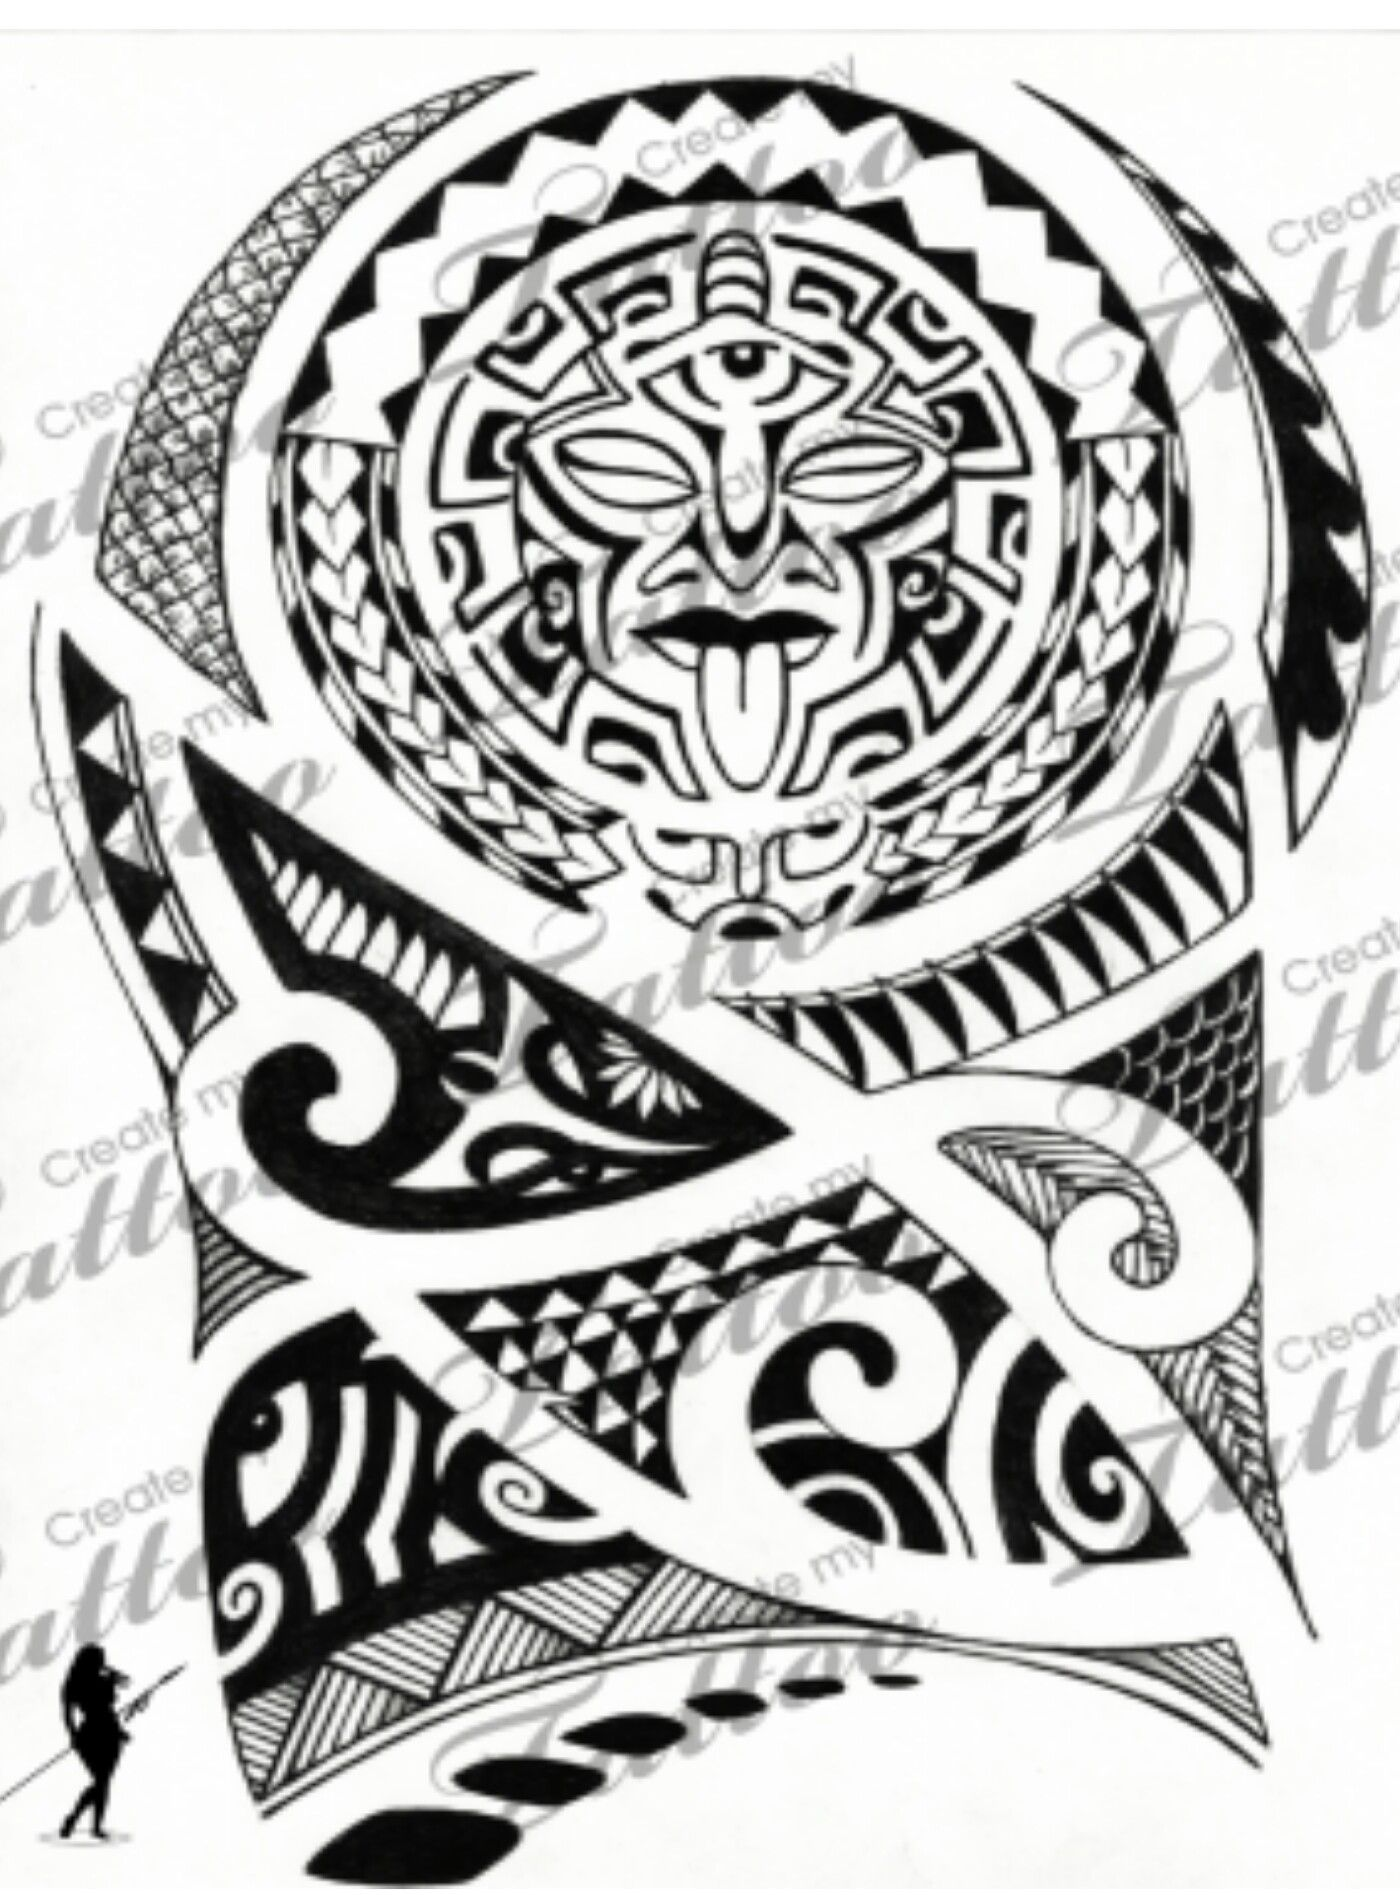 Favoritos Pin by Lim Wc on tattoos   Pinterest   Maori, Tattoo and Tatoo EN47